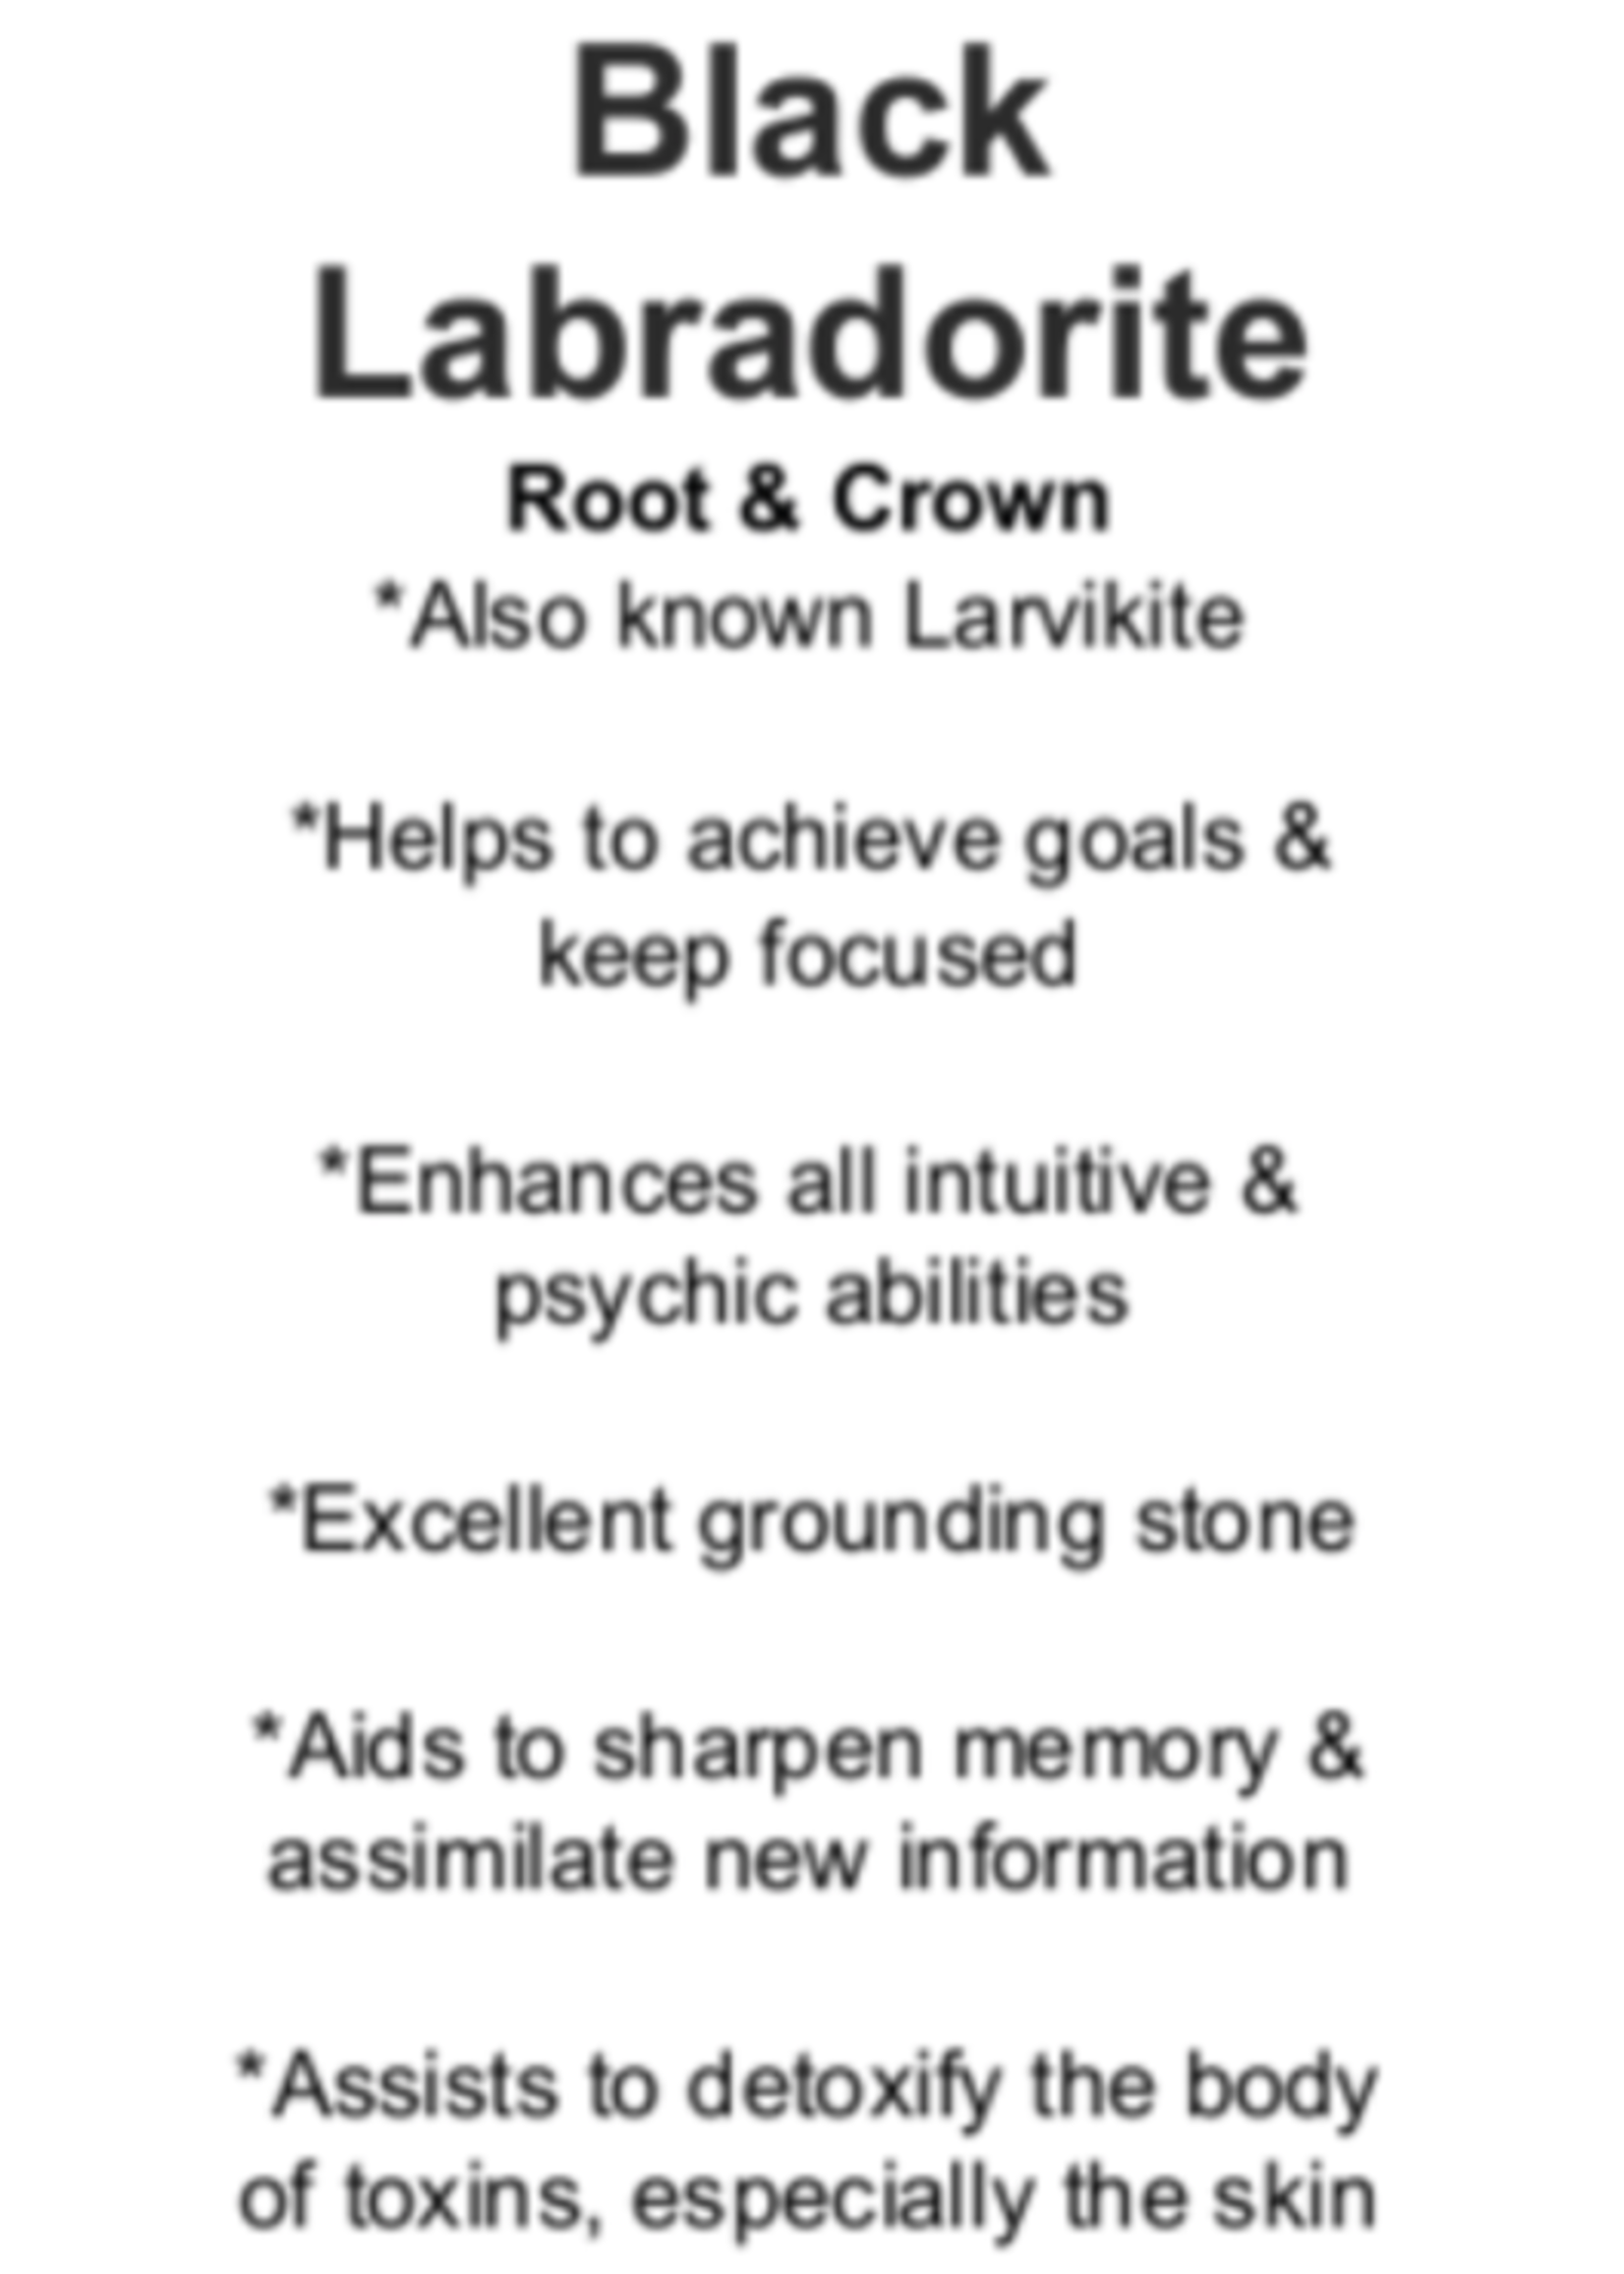 Black Labradorite Cards - Box of 250